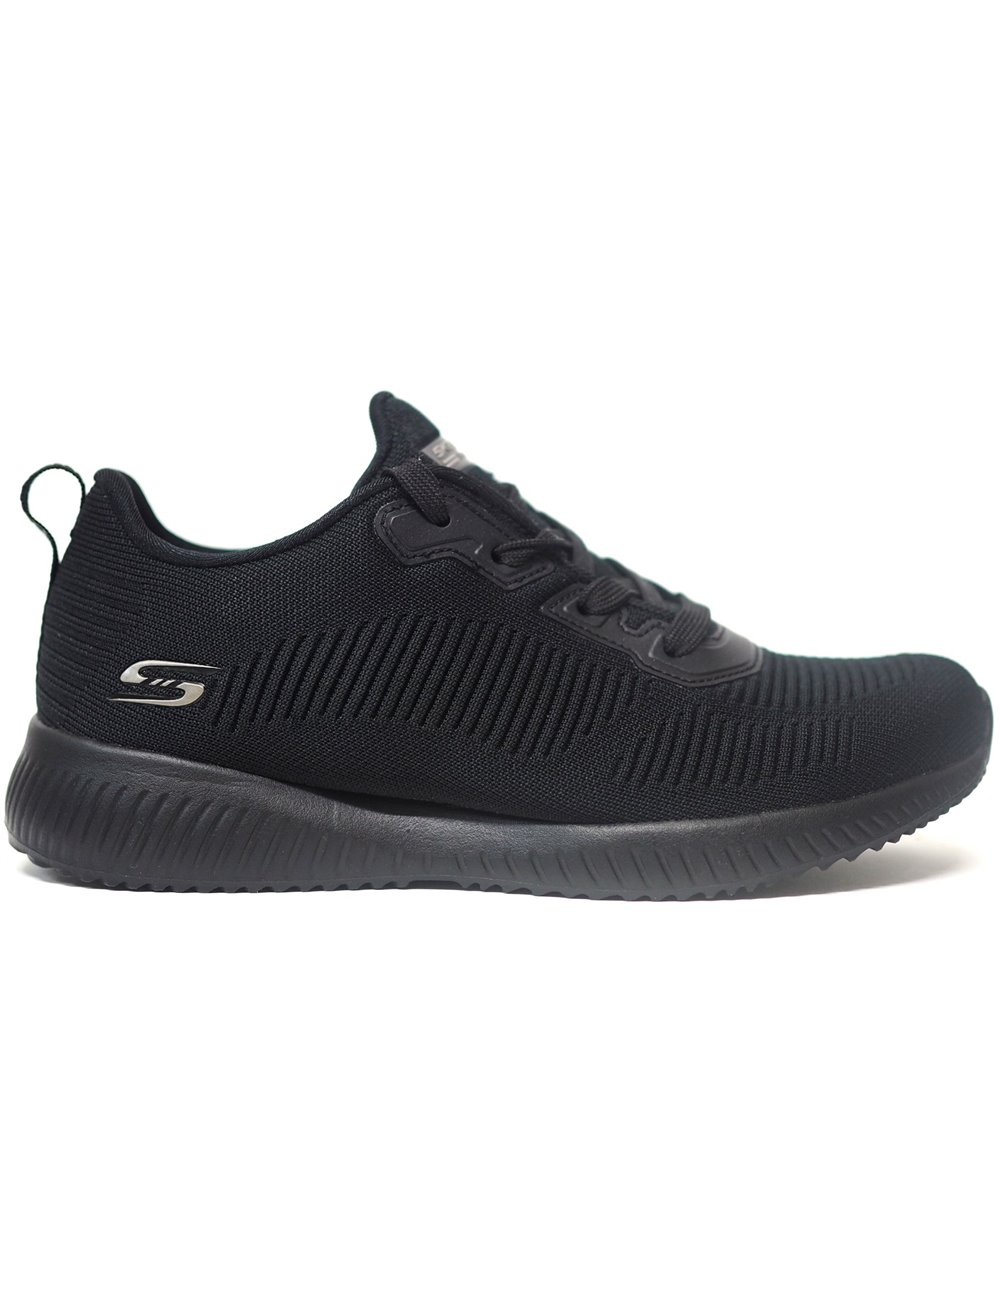 Zapatillas Skechers 32504 Negro